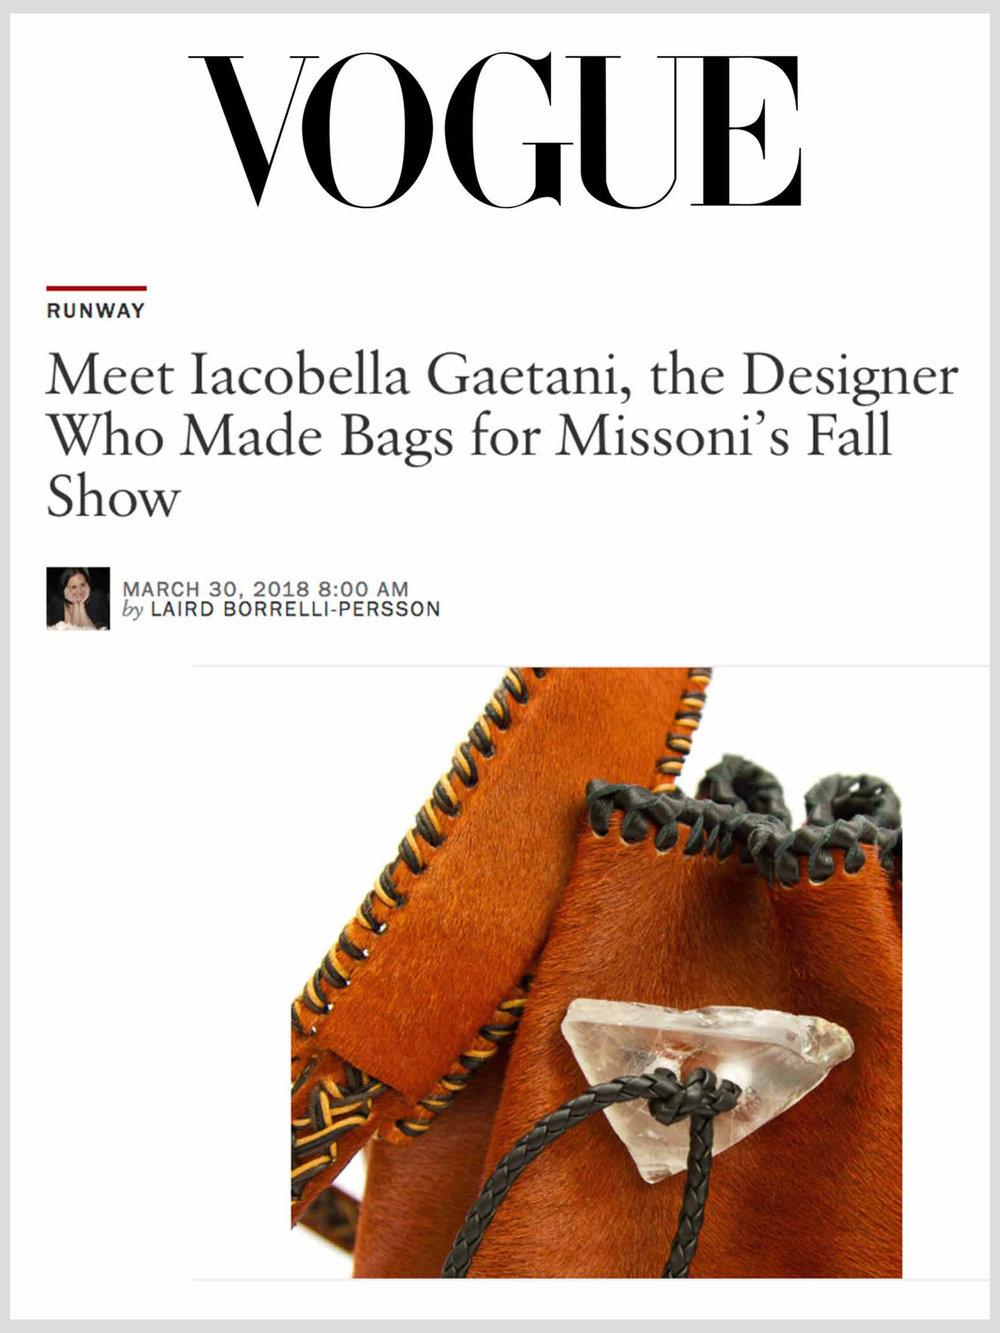 Vogue_iacobella_missoni.jpg